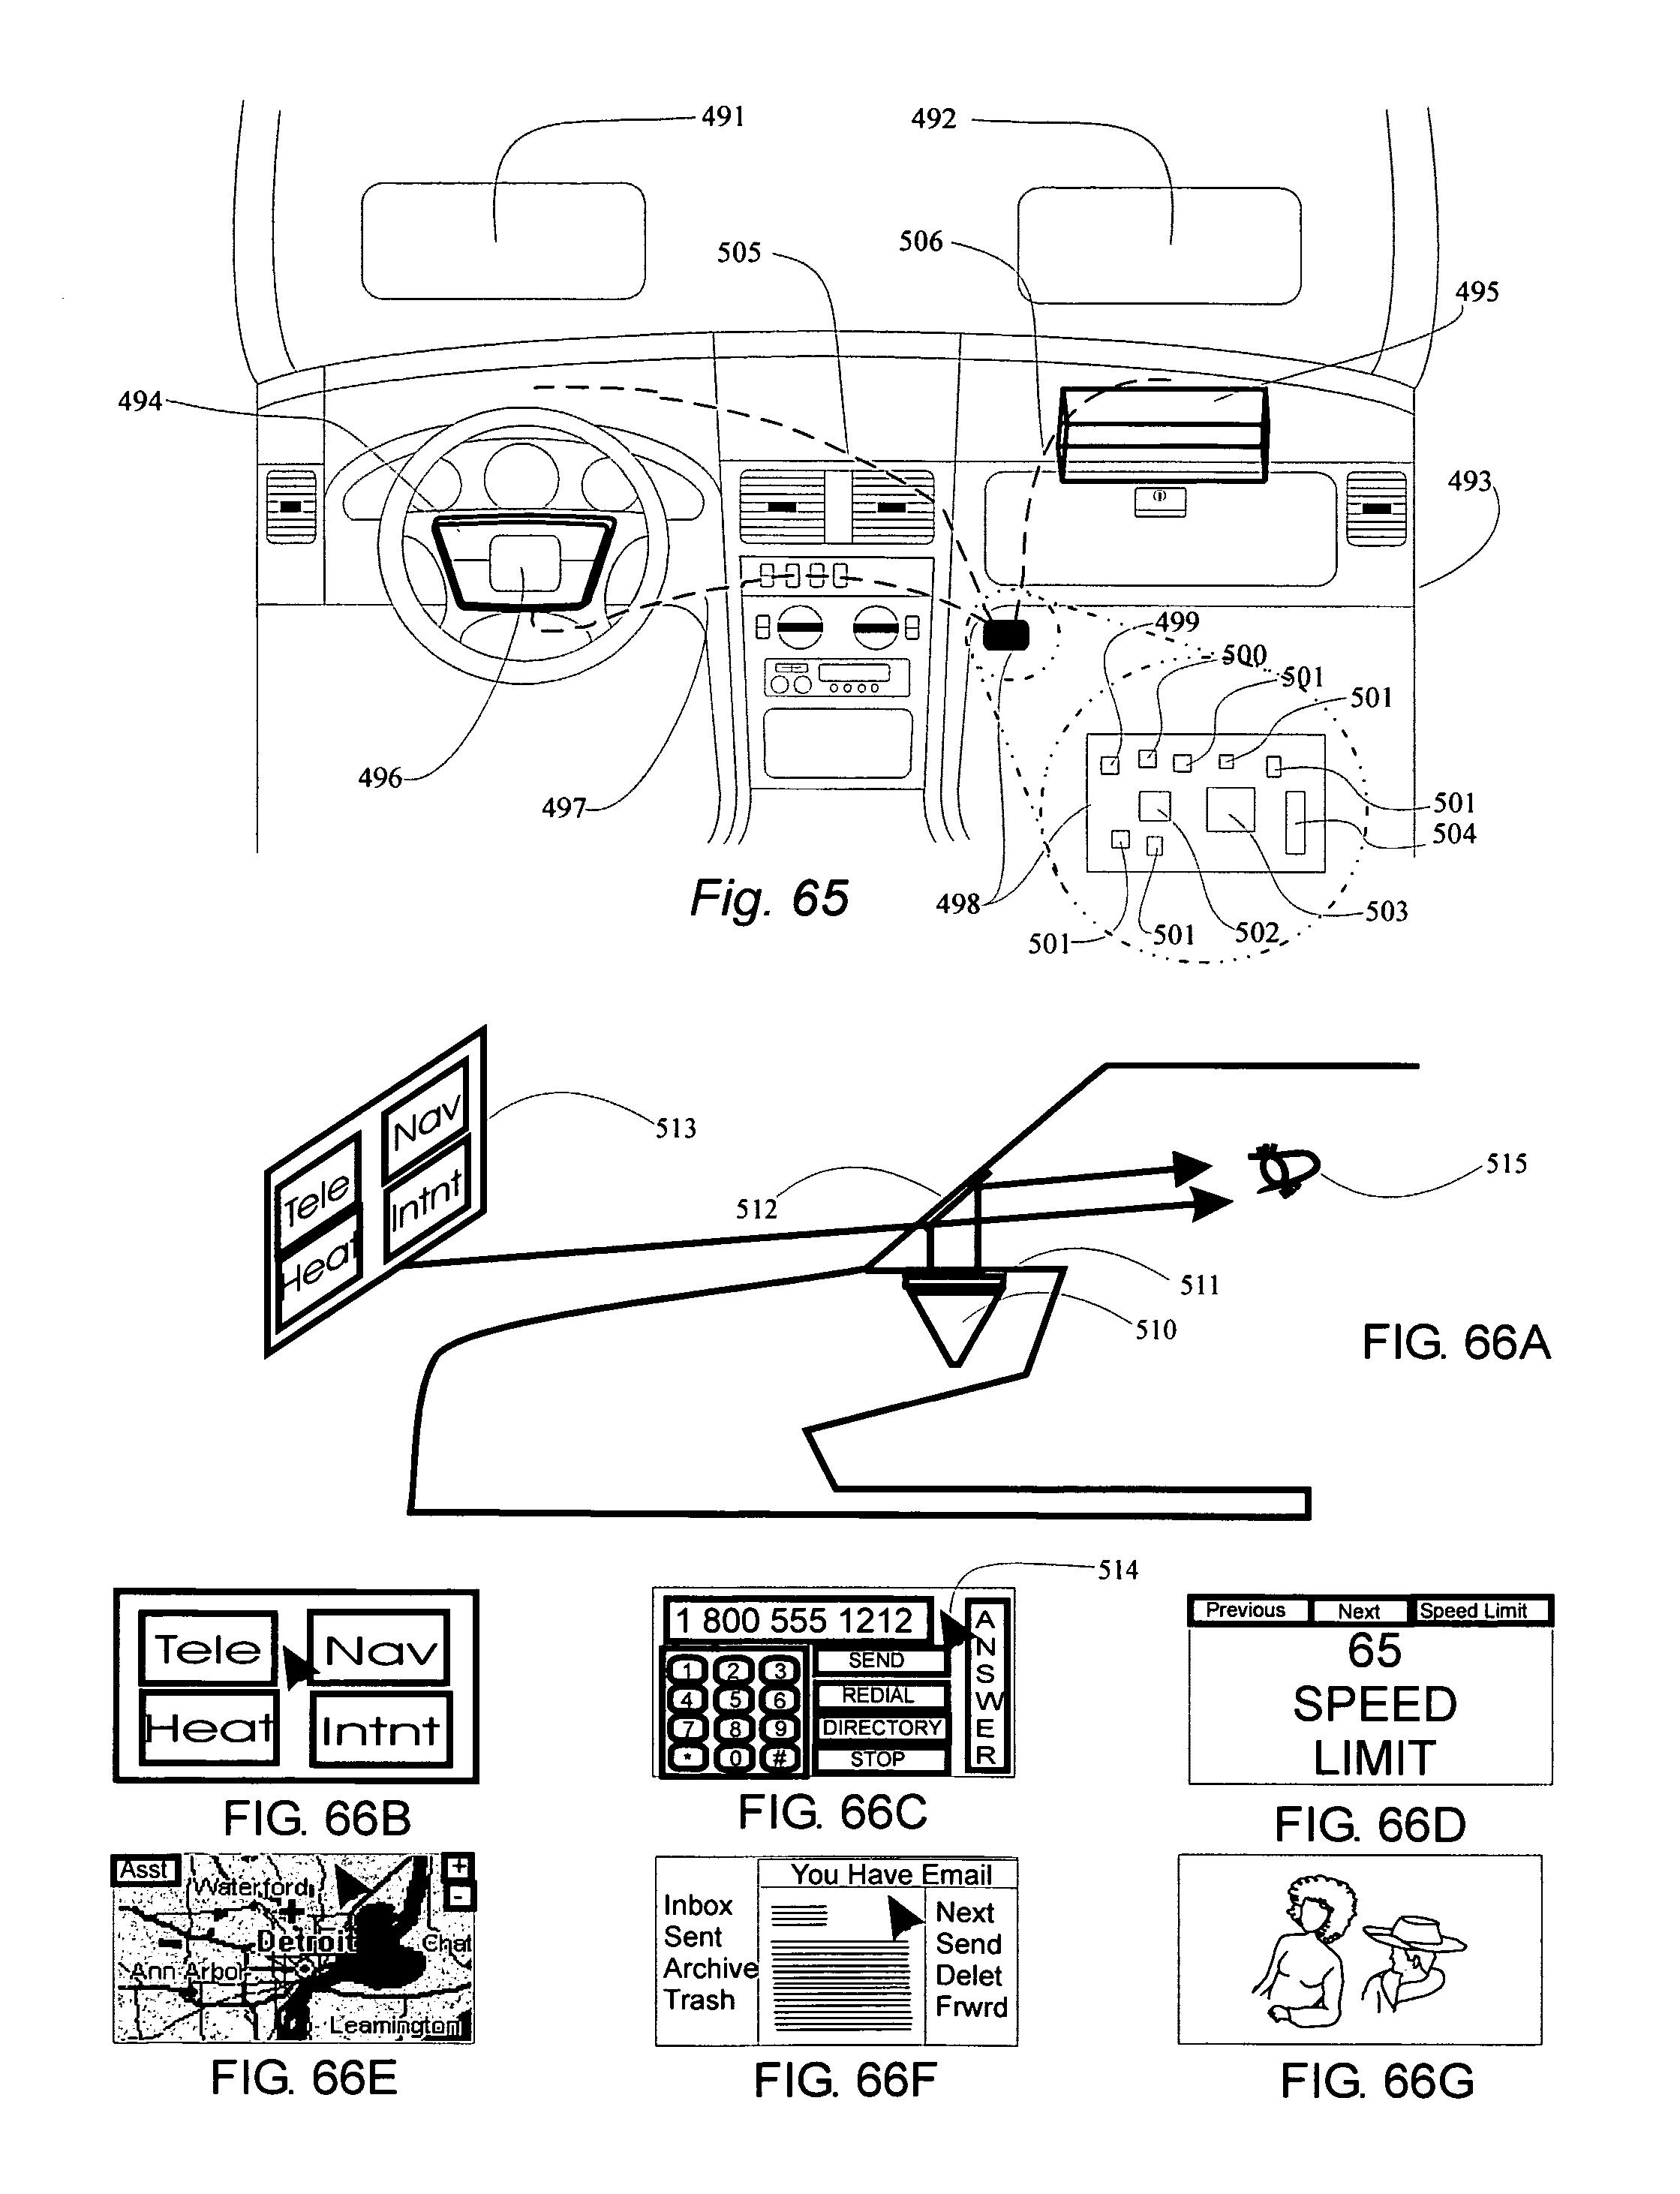 Patent Us 7421321 B2 Generator Op Circuit Moreover 555 Timer Diagram Likewise Smart Images